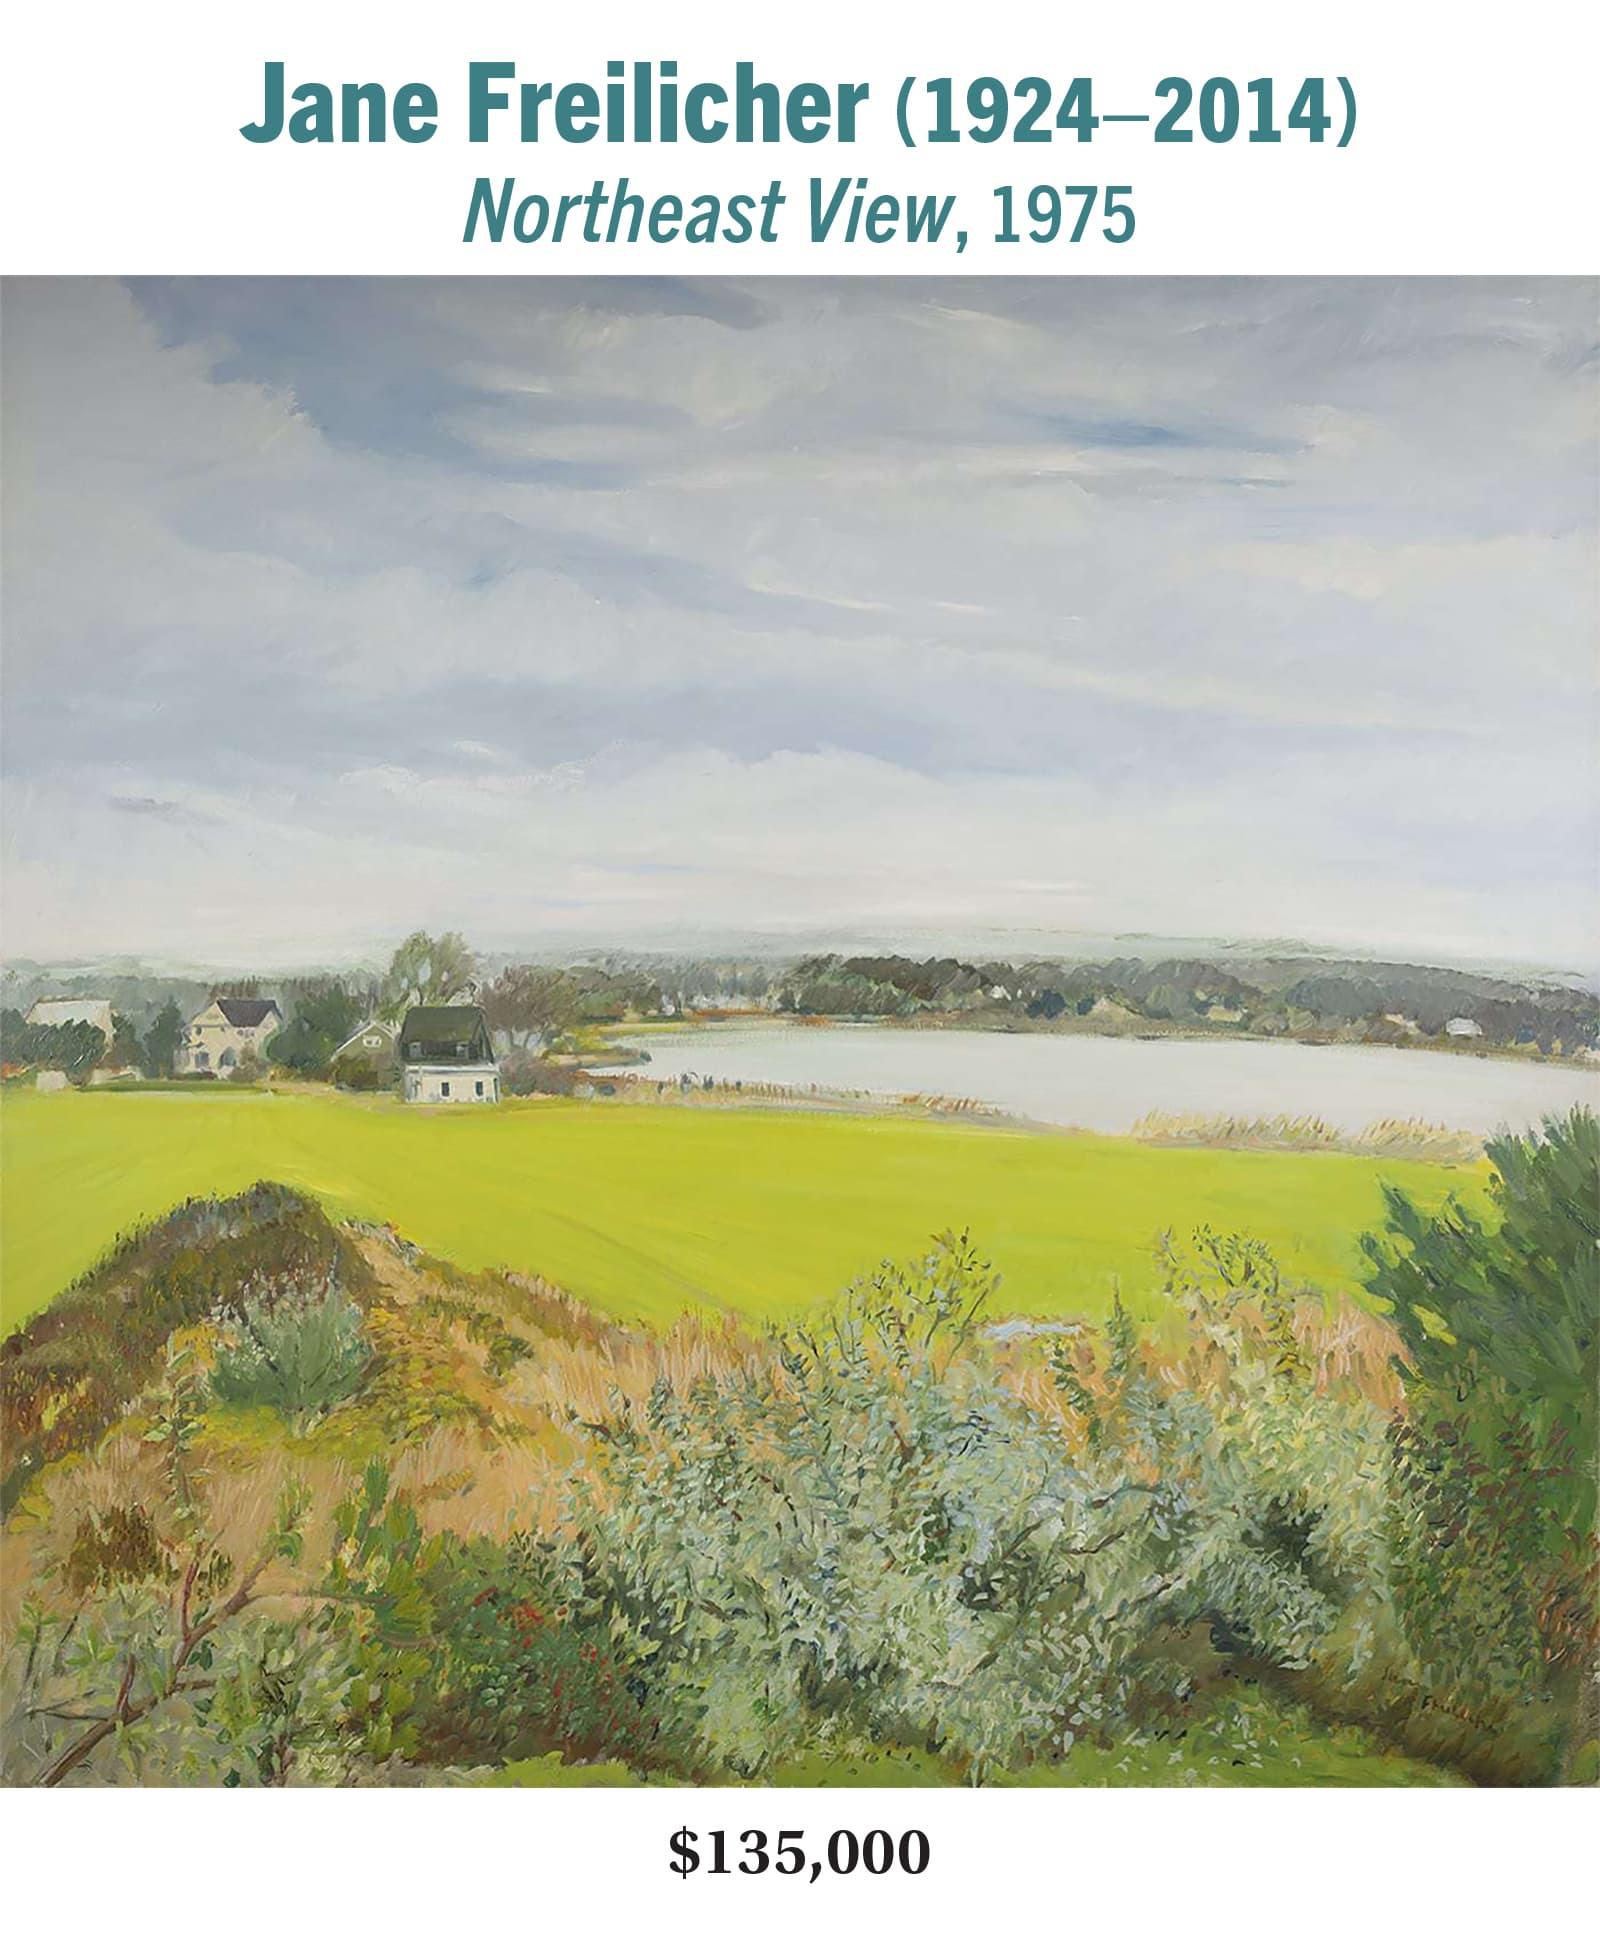 Jane Freilicher (1924–2014), Northeast View, 1975, oil on canvas, American modernist landscape painting